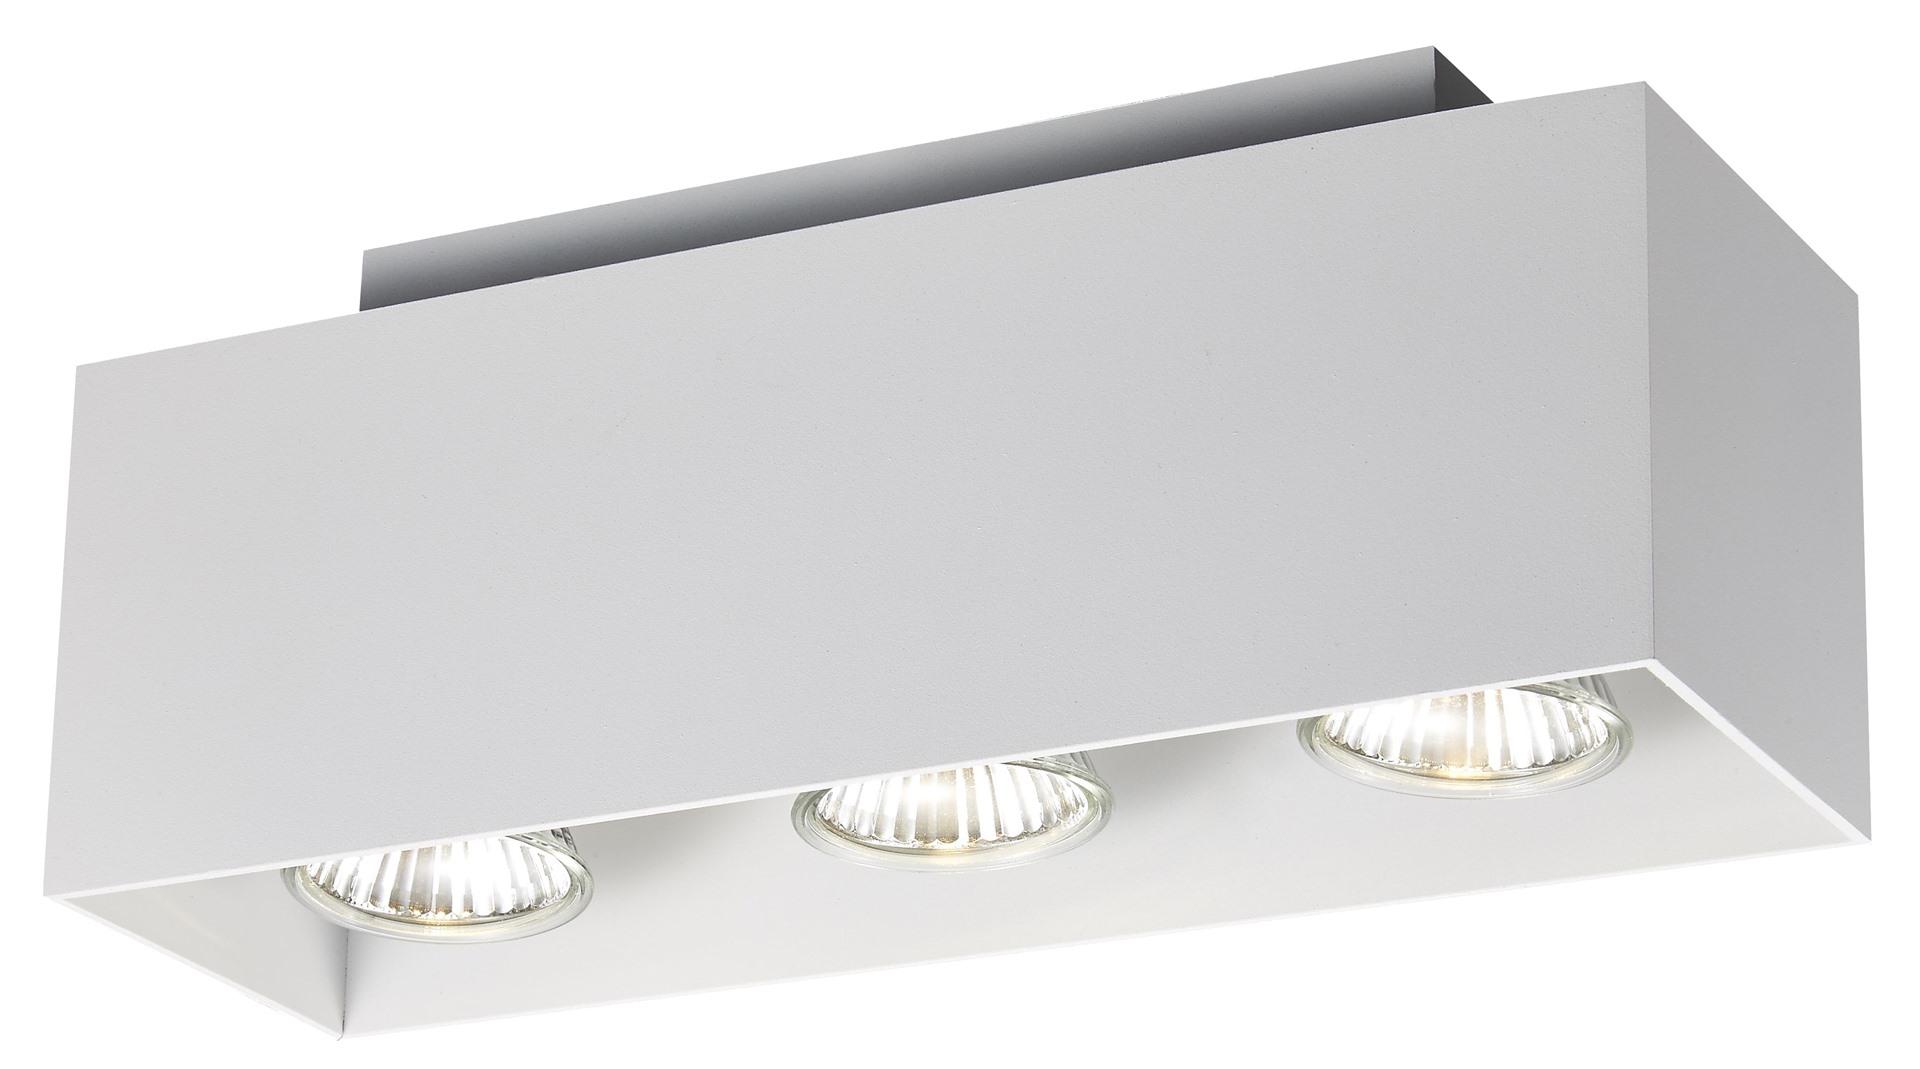 Plafondlamp wit dimbaar led krea